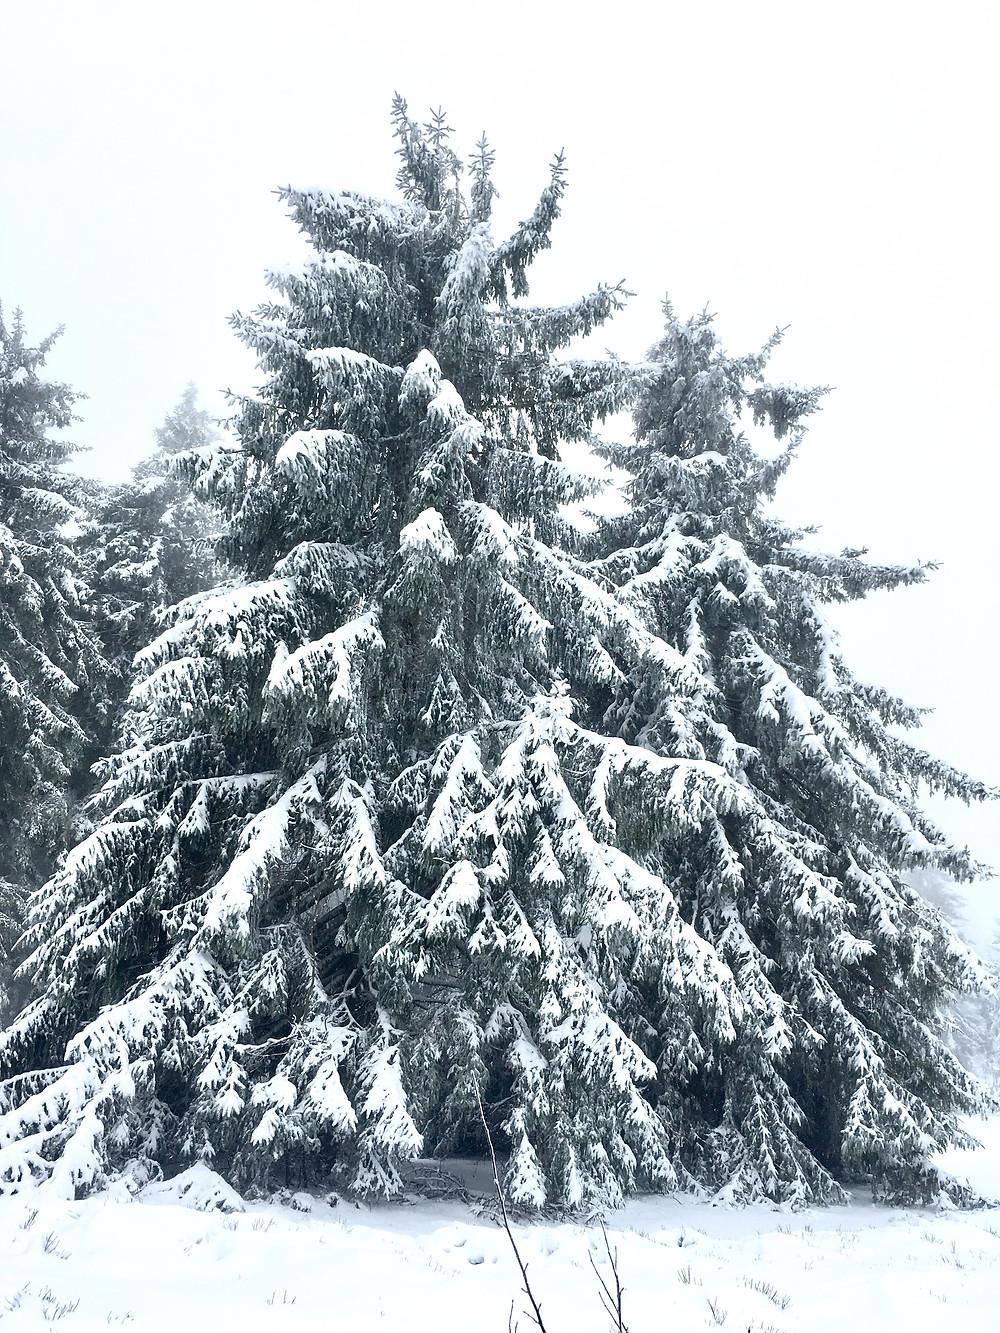 sapin sous la neige et brouillard